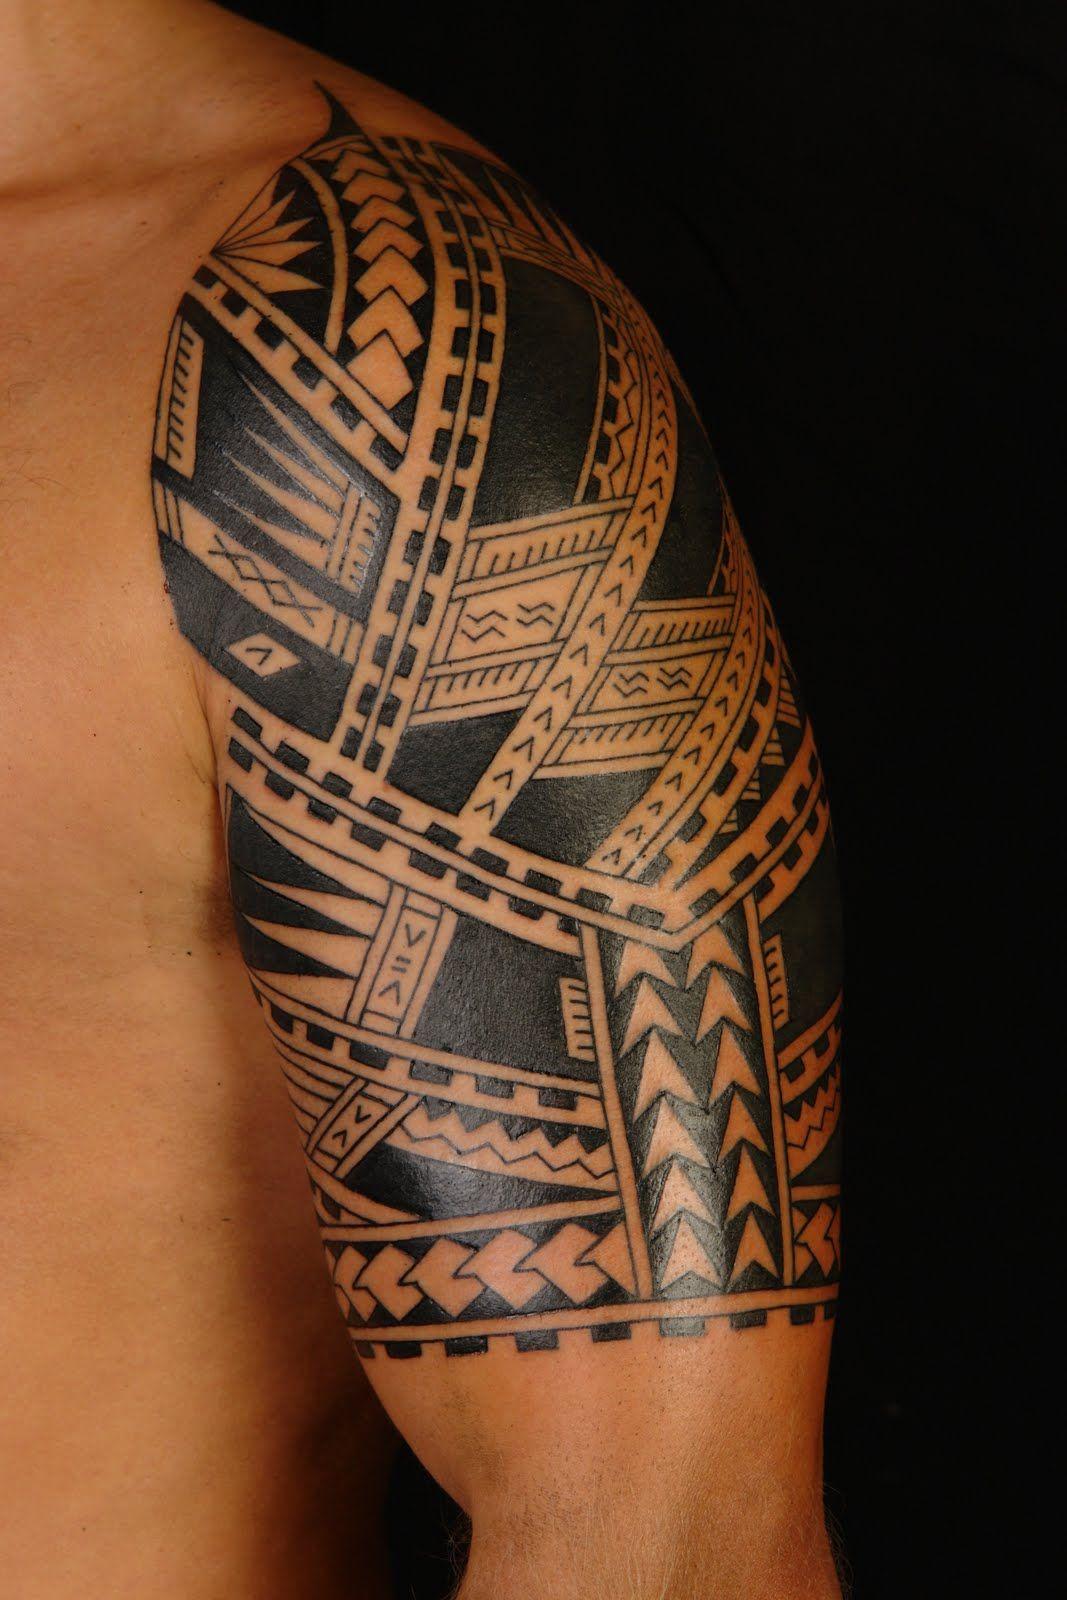 Tatuajes Maories Significado Y 9 Temas Tattoo Designs Tatuaje